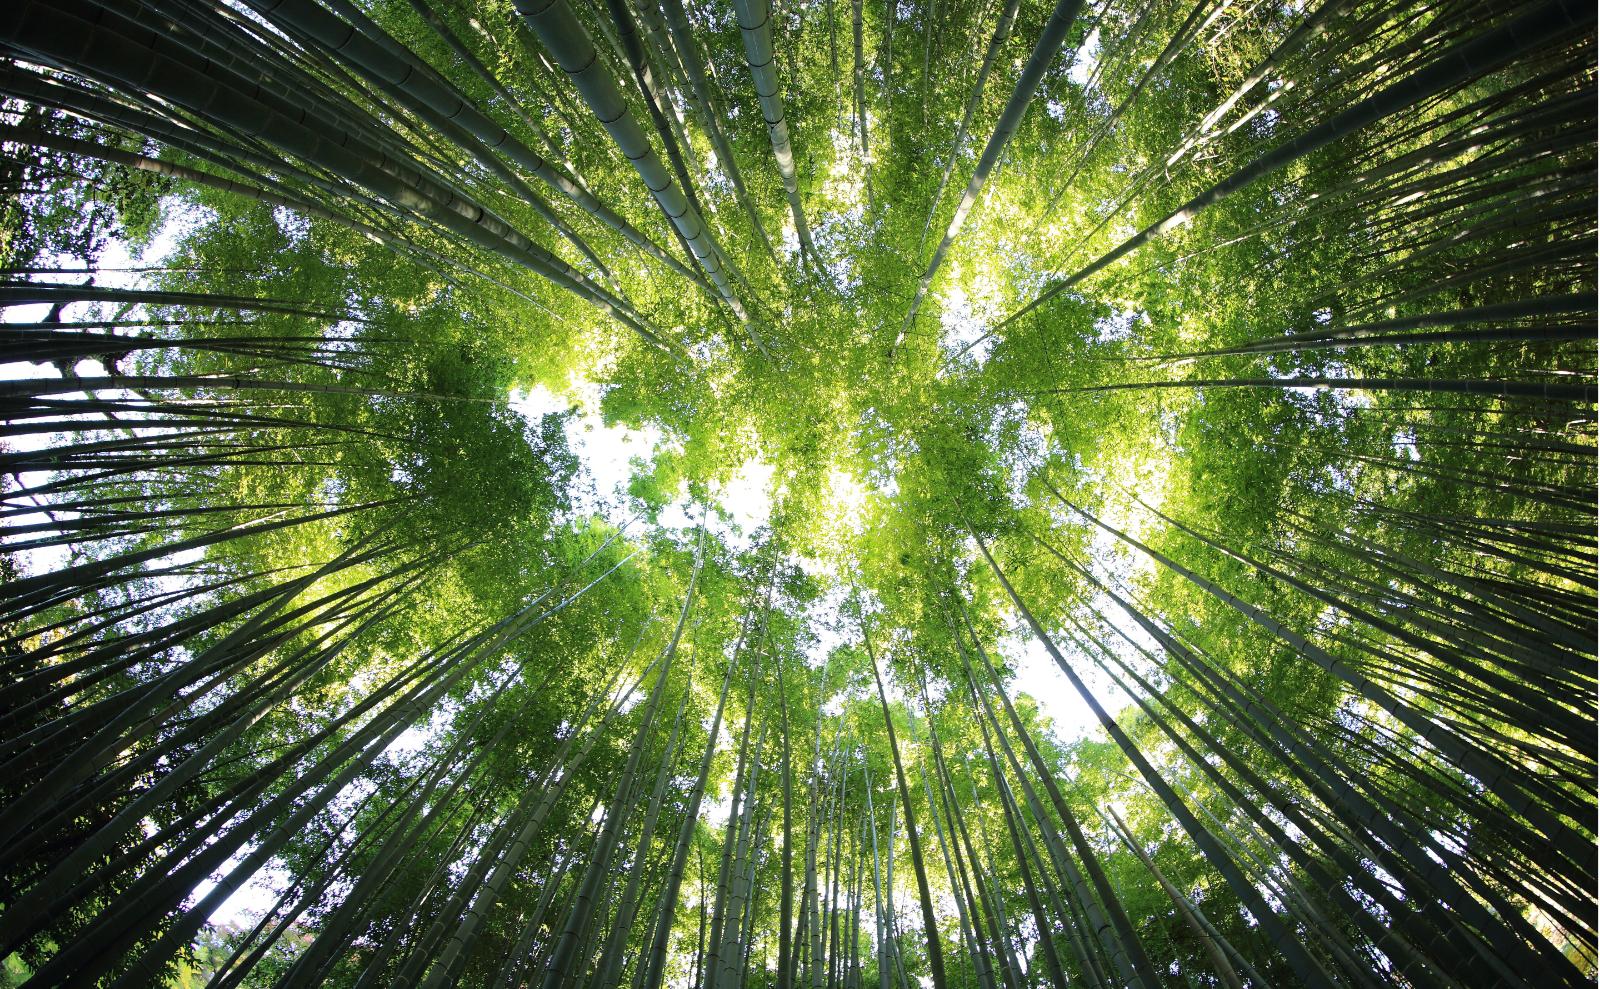 green trees soaring overhead